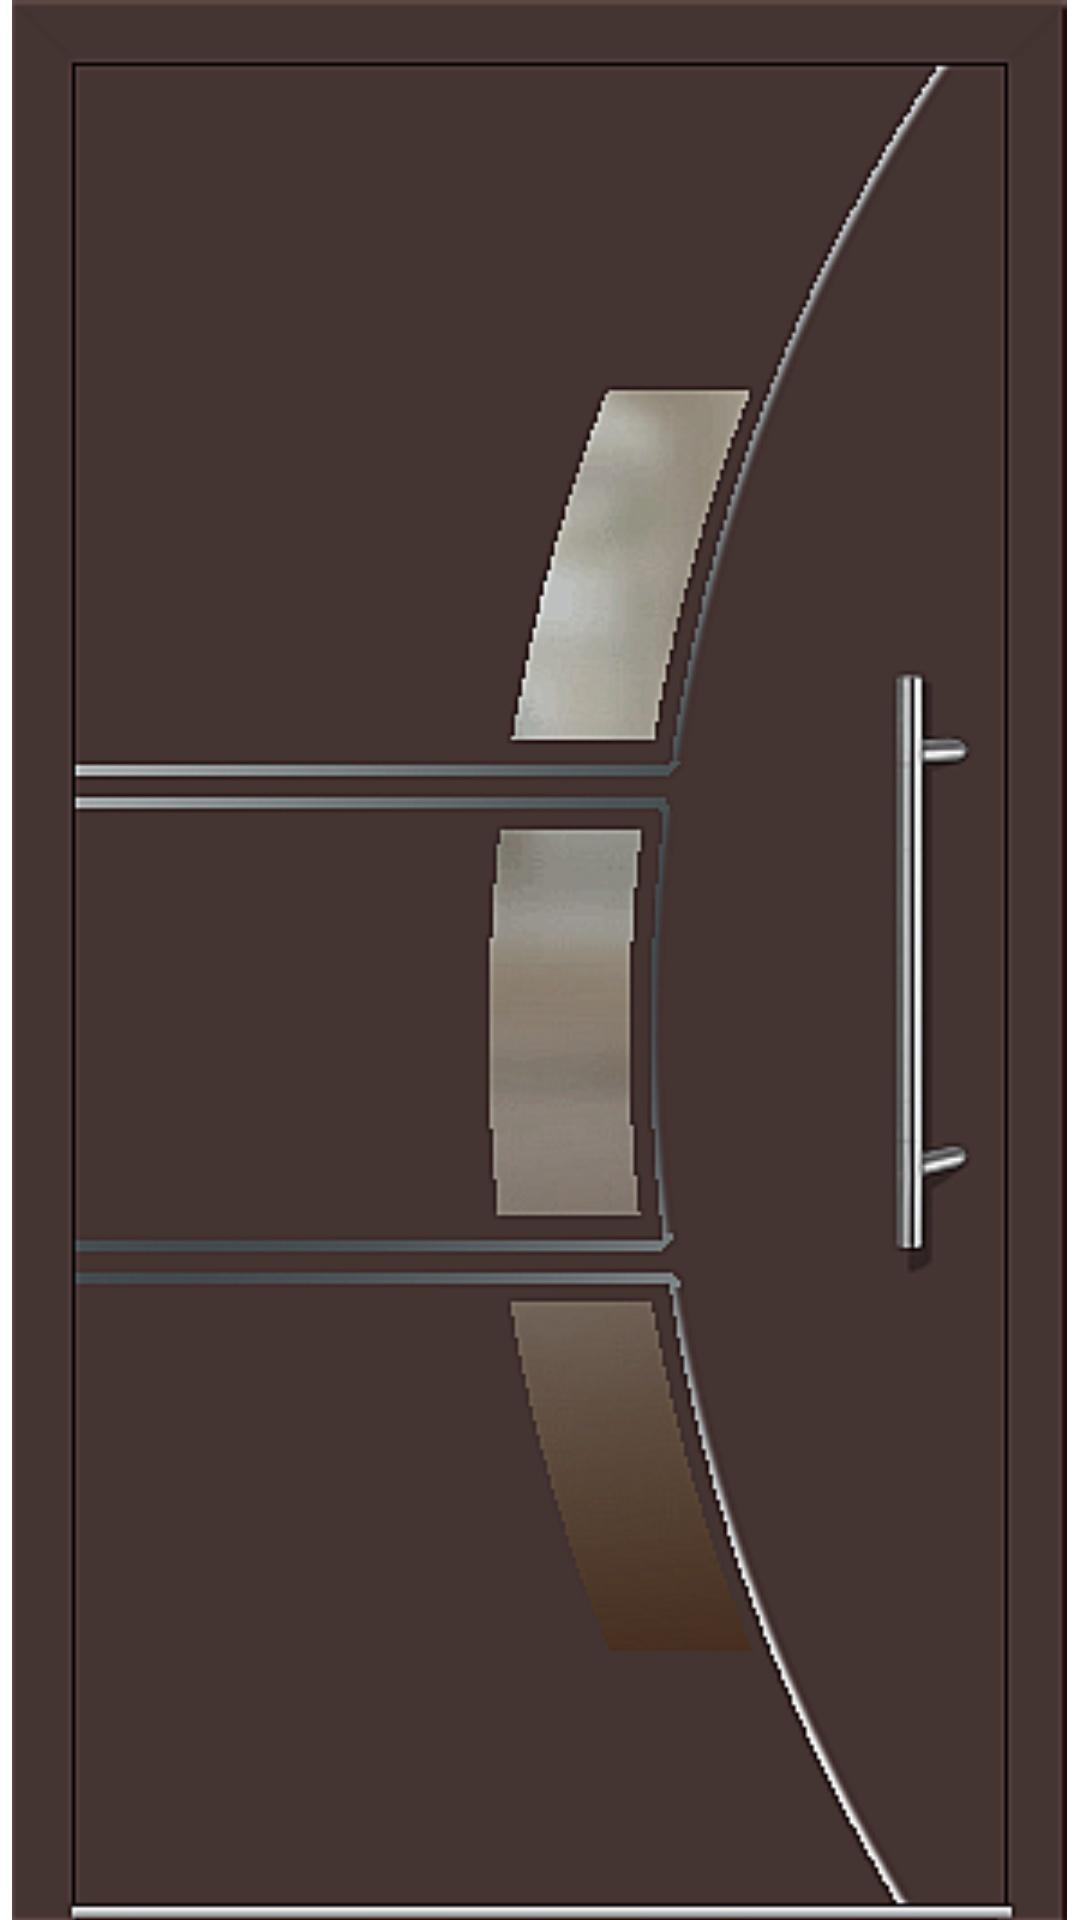 Kunststoff Haustür Modell 6166-58 mahagonibraun